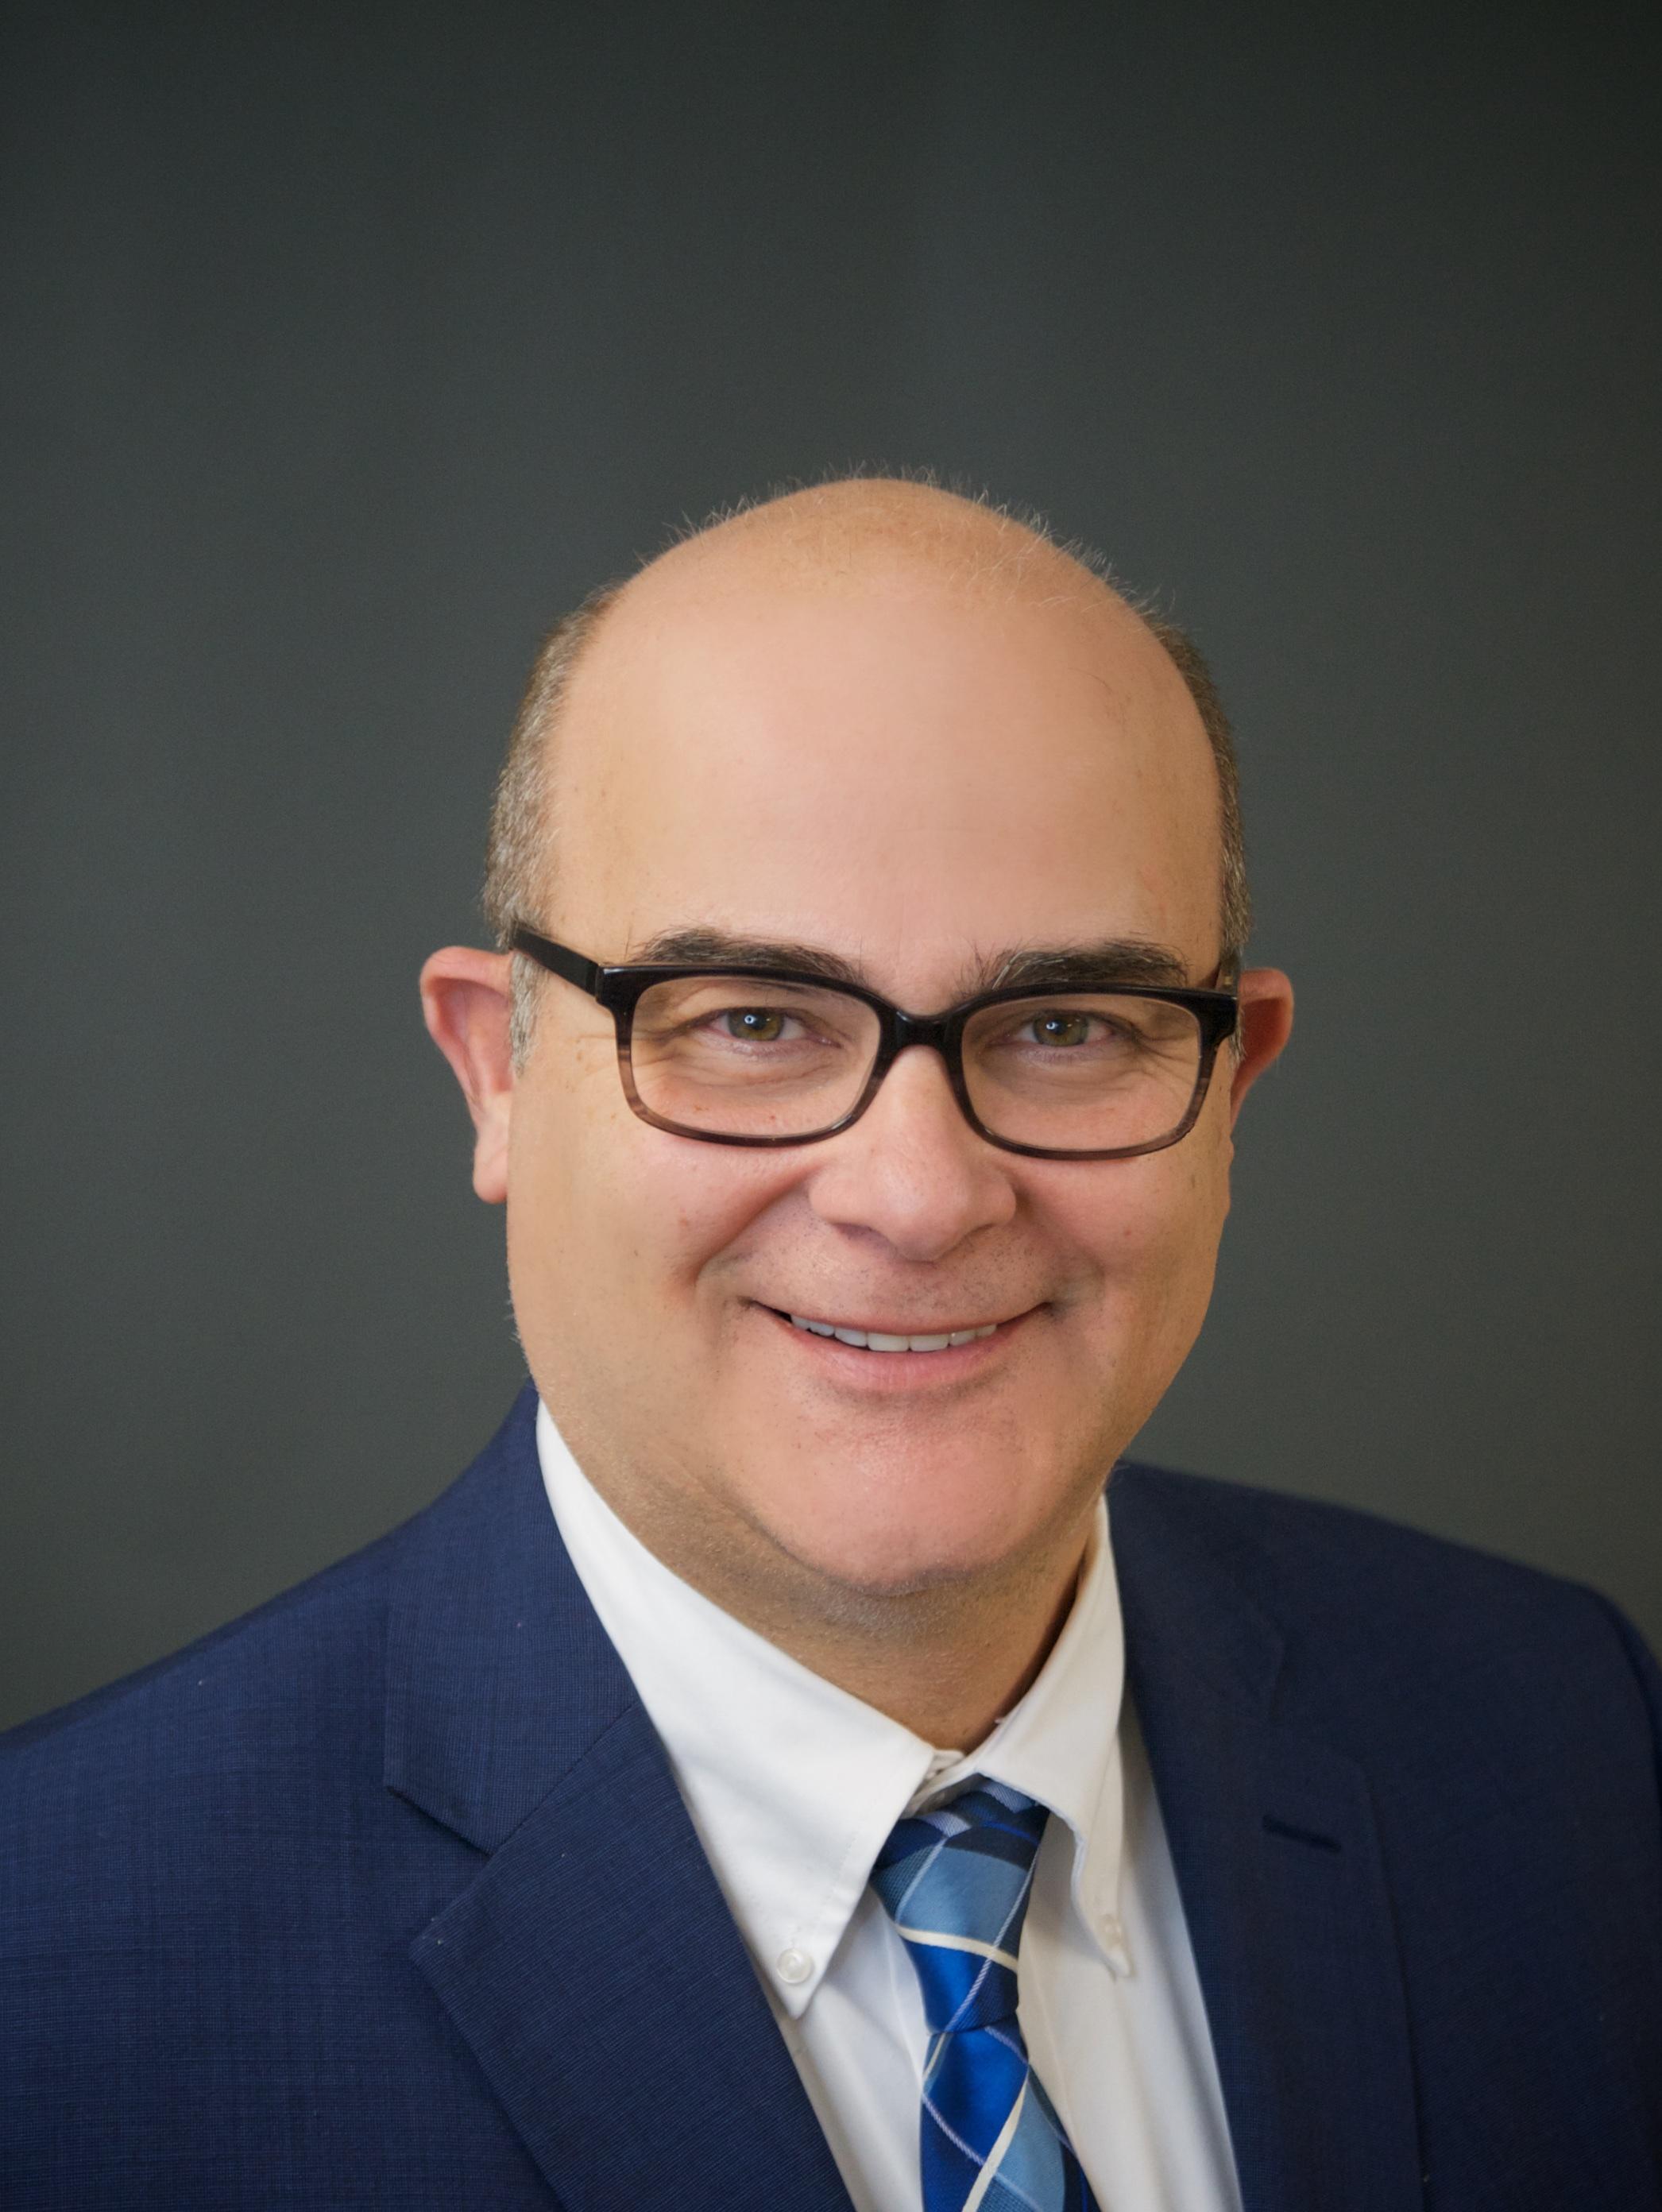 William Ansbrow<br/> Director of Finance/CFO